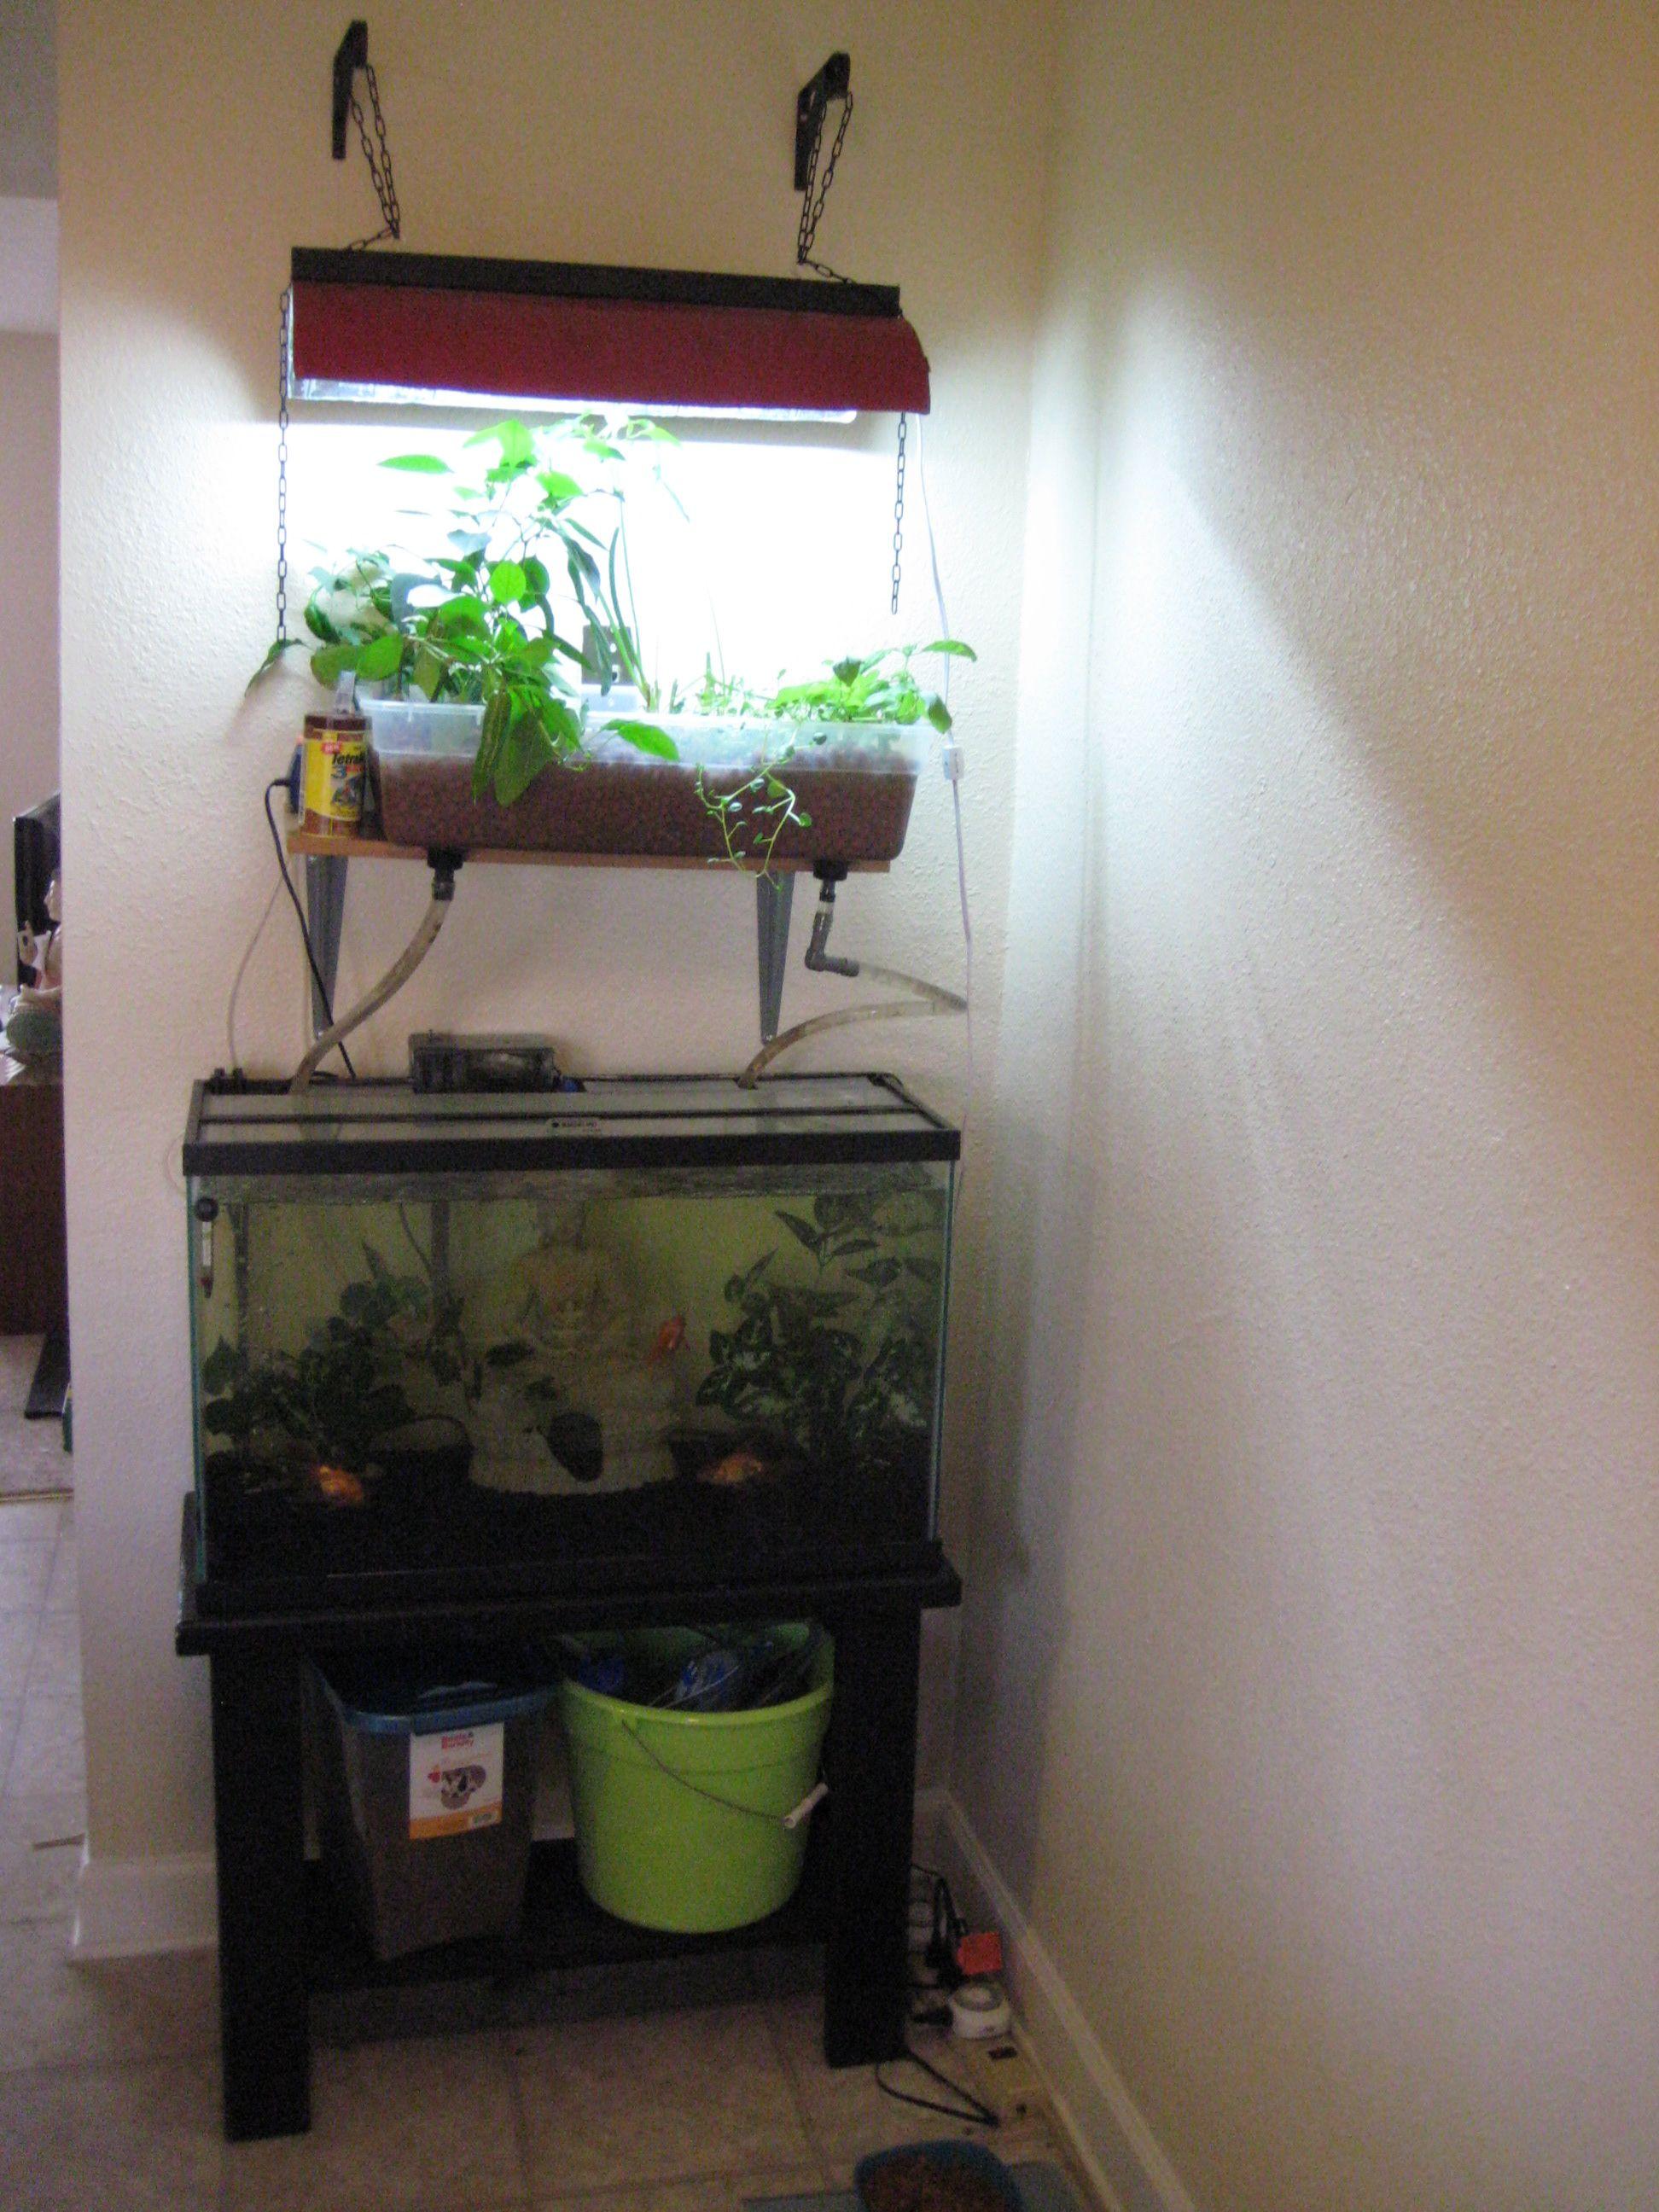 Diy aquaponics fish tank google search aquaponics for Hydroponics fish tank